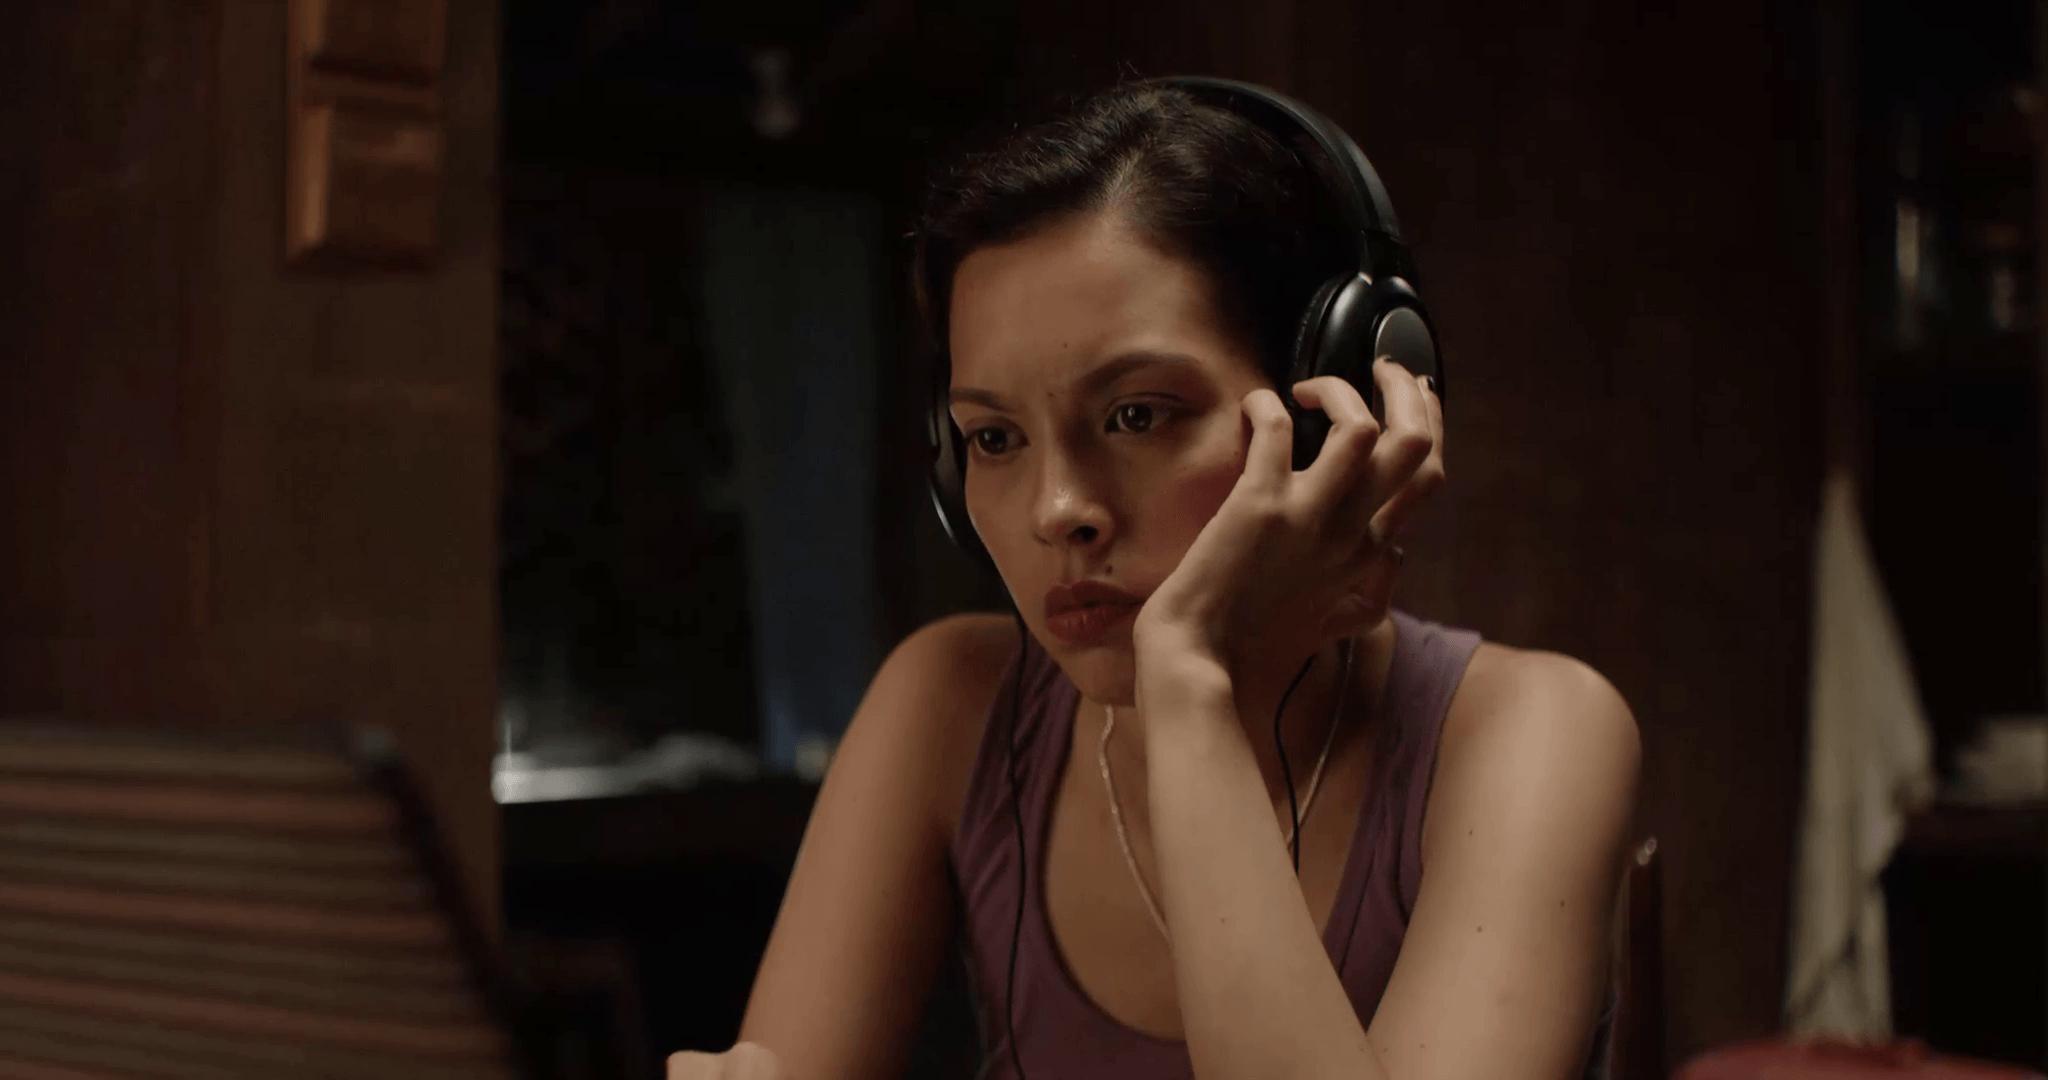 medusae movie 2017